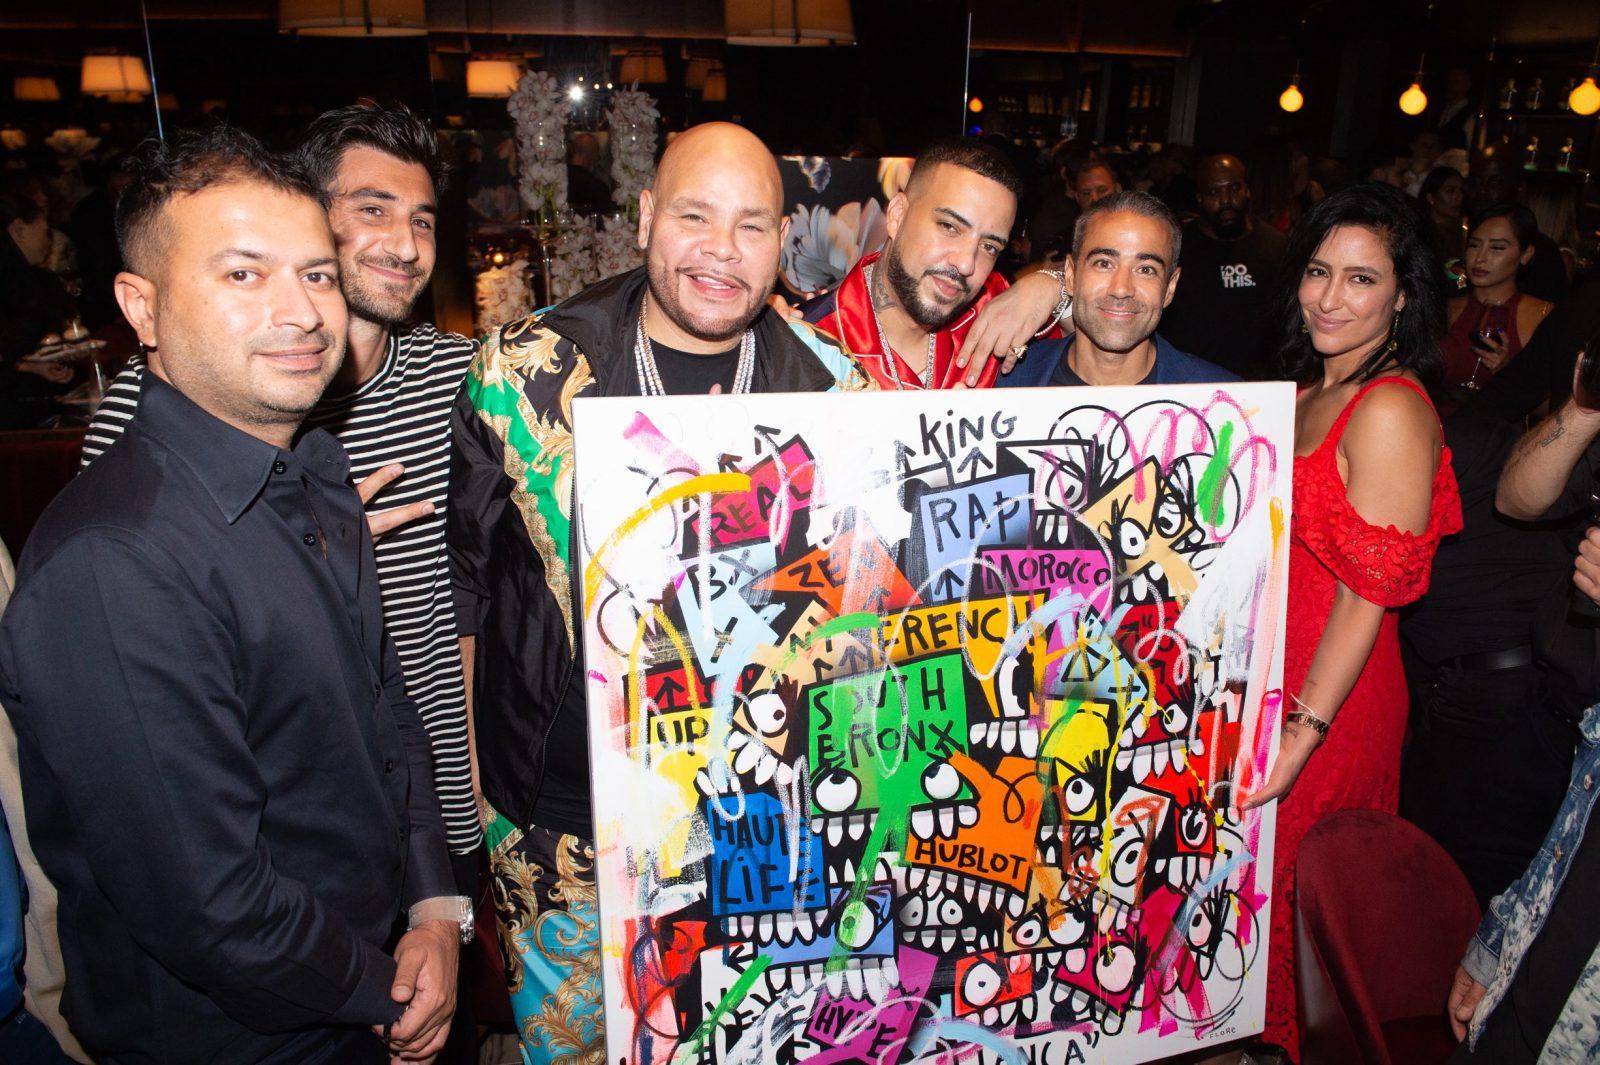 Kamal Hotchandani, Flore, Fat Joe, French Montana, Jean-François Sberro and Violet Camacho